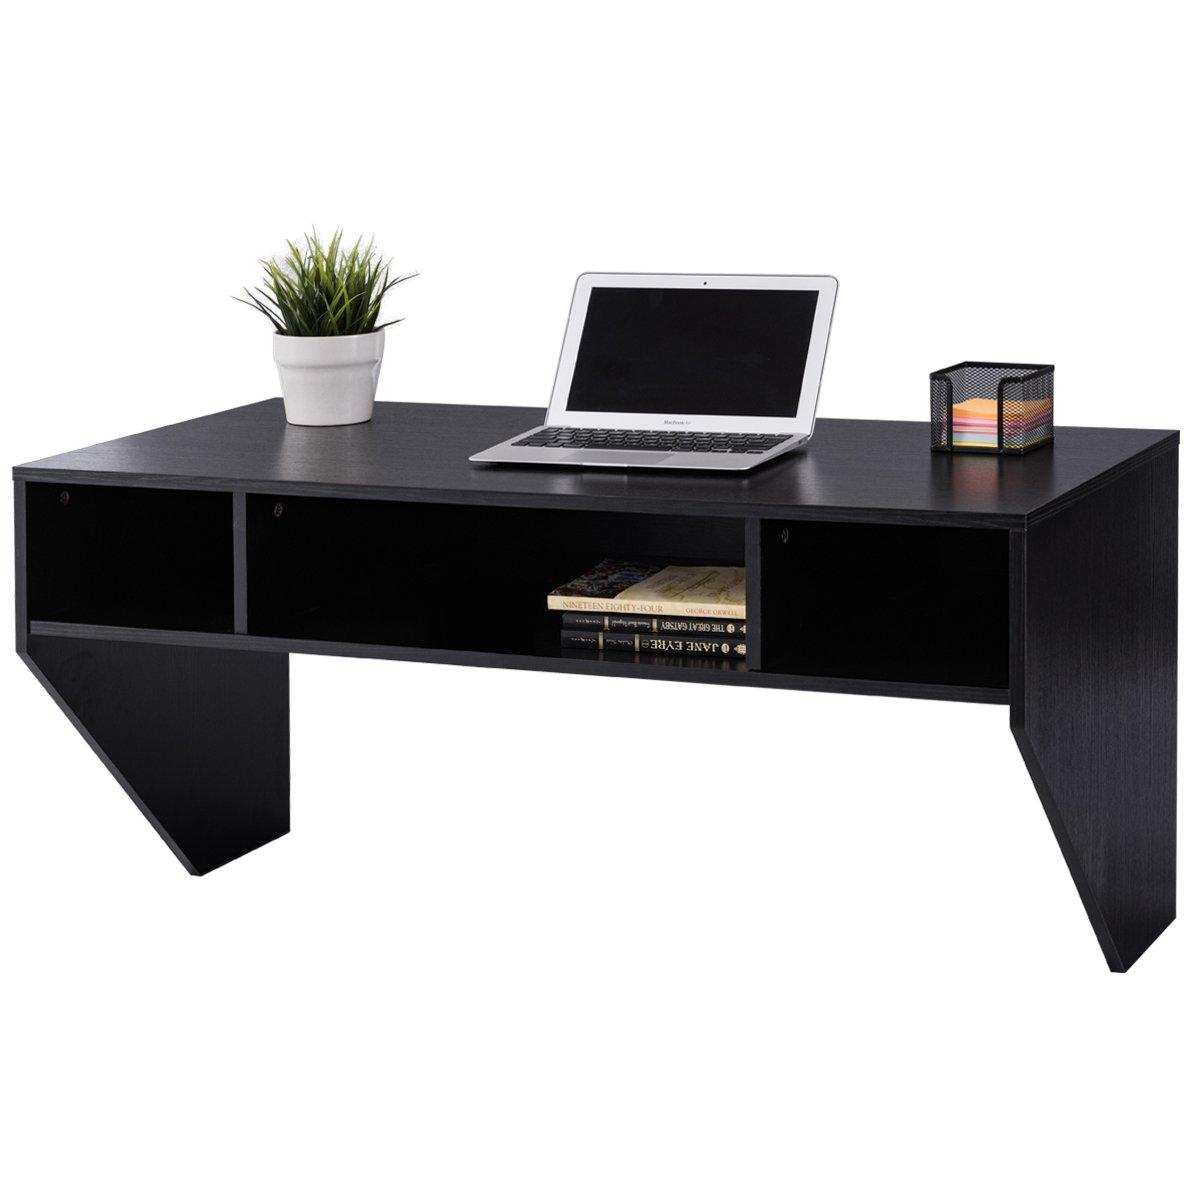 Giantex Wall Mounted Floating Computer Desk With Storage Shelves for Home Office Bedroom Home Work Station Desk, Black